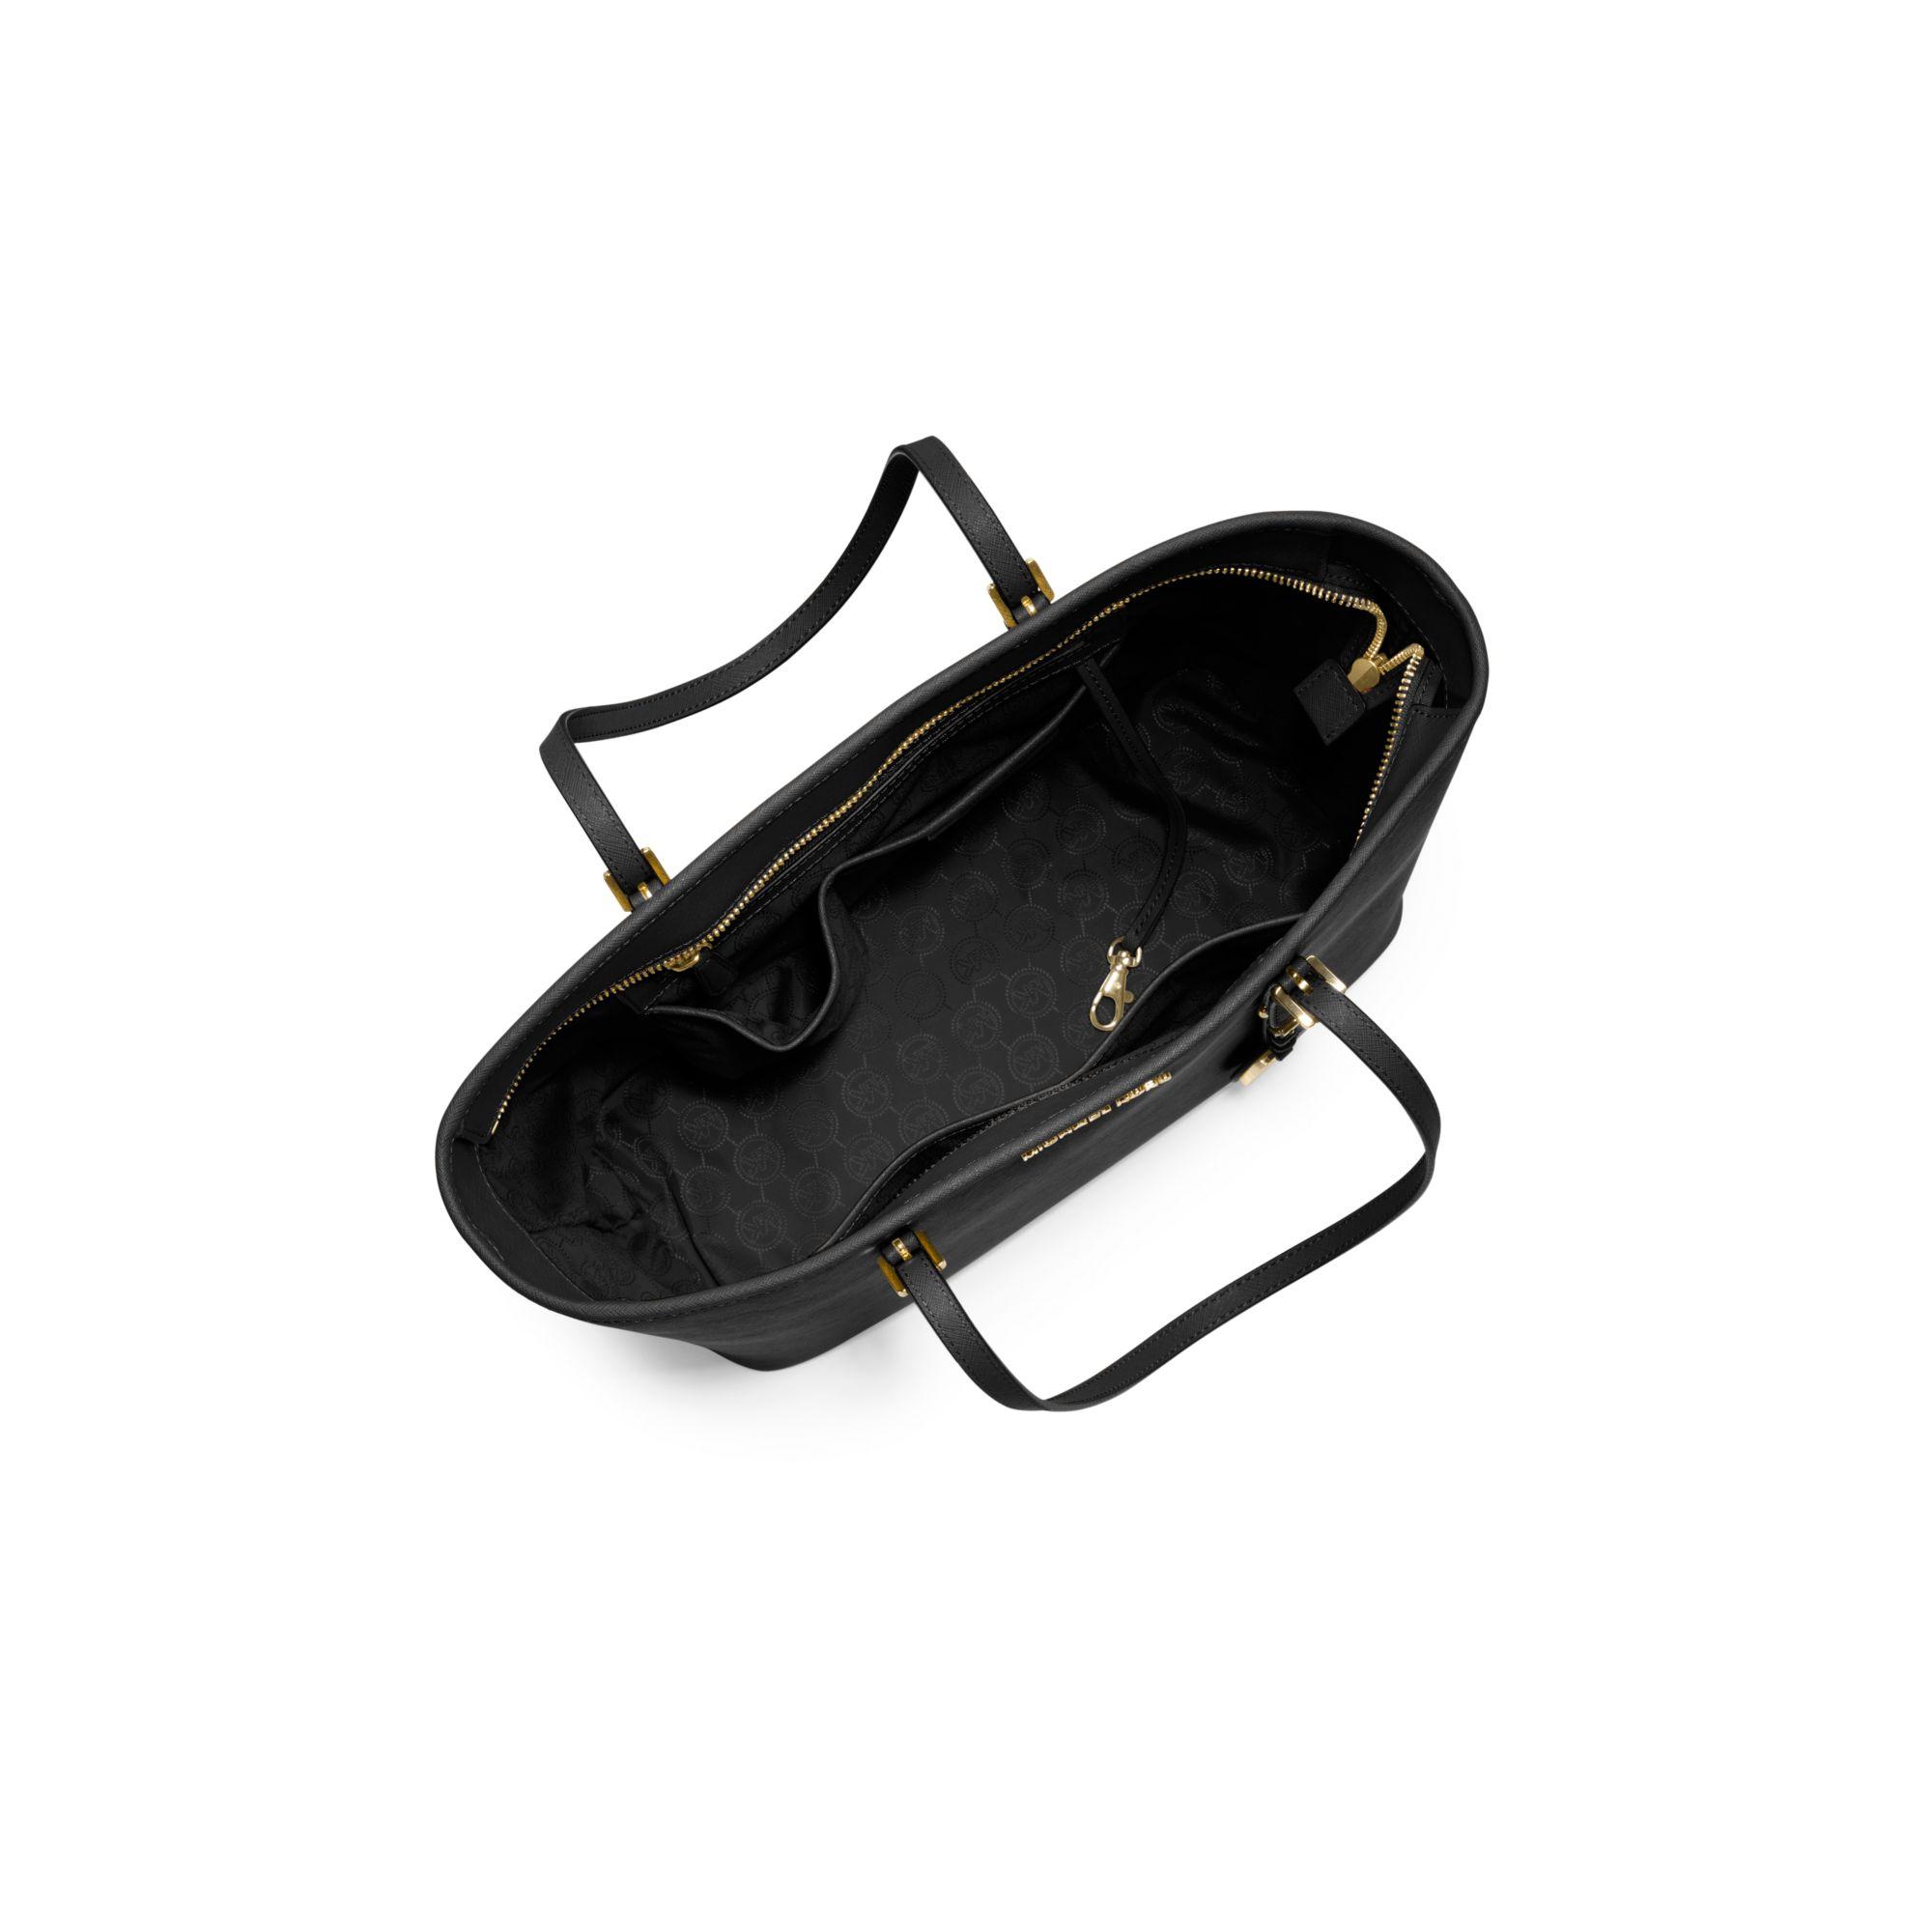 Lyst Michael Kors Jet Set Travel Saffiano Leather Top